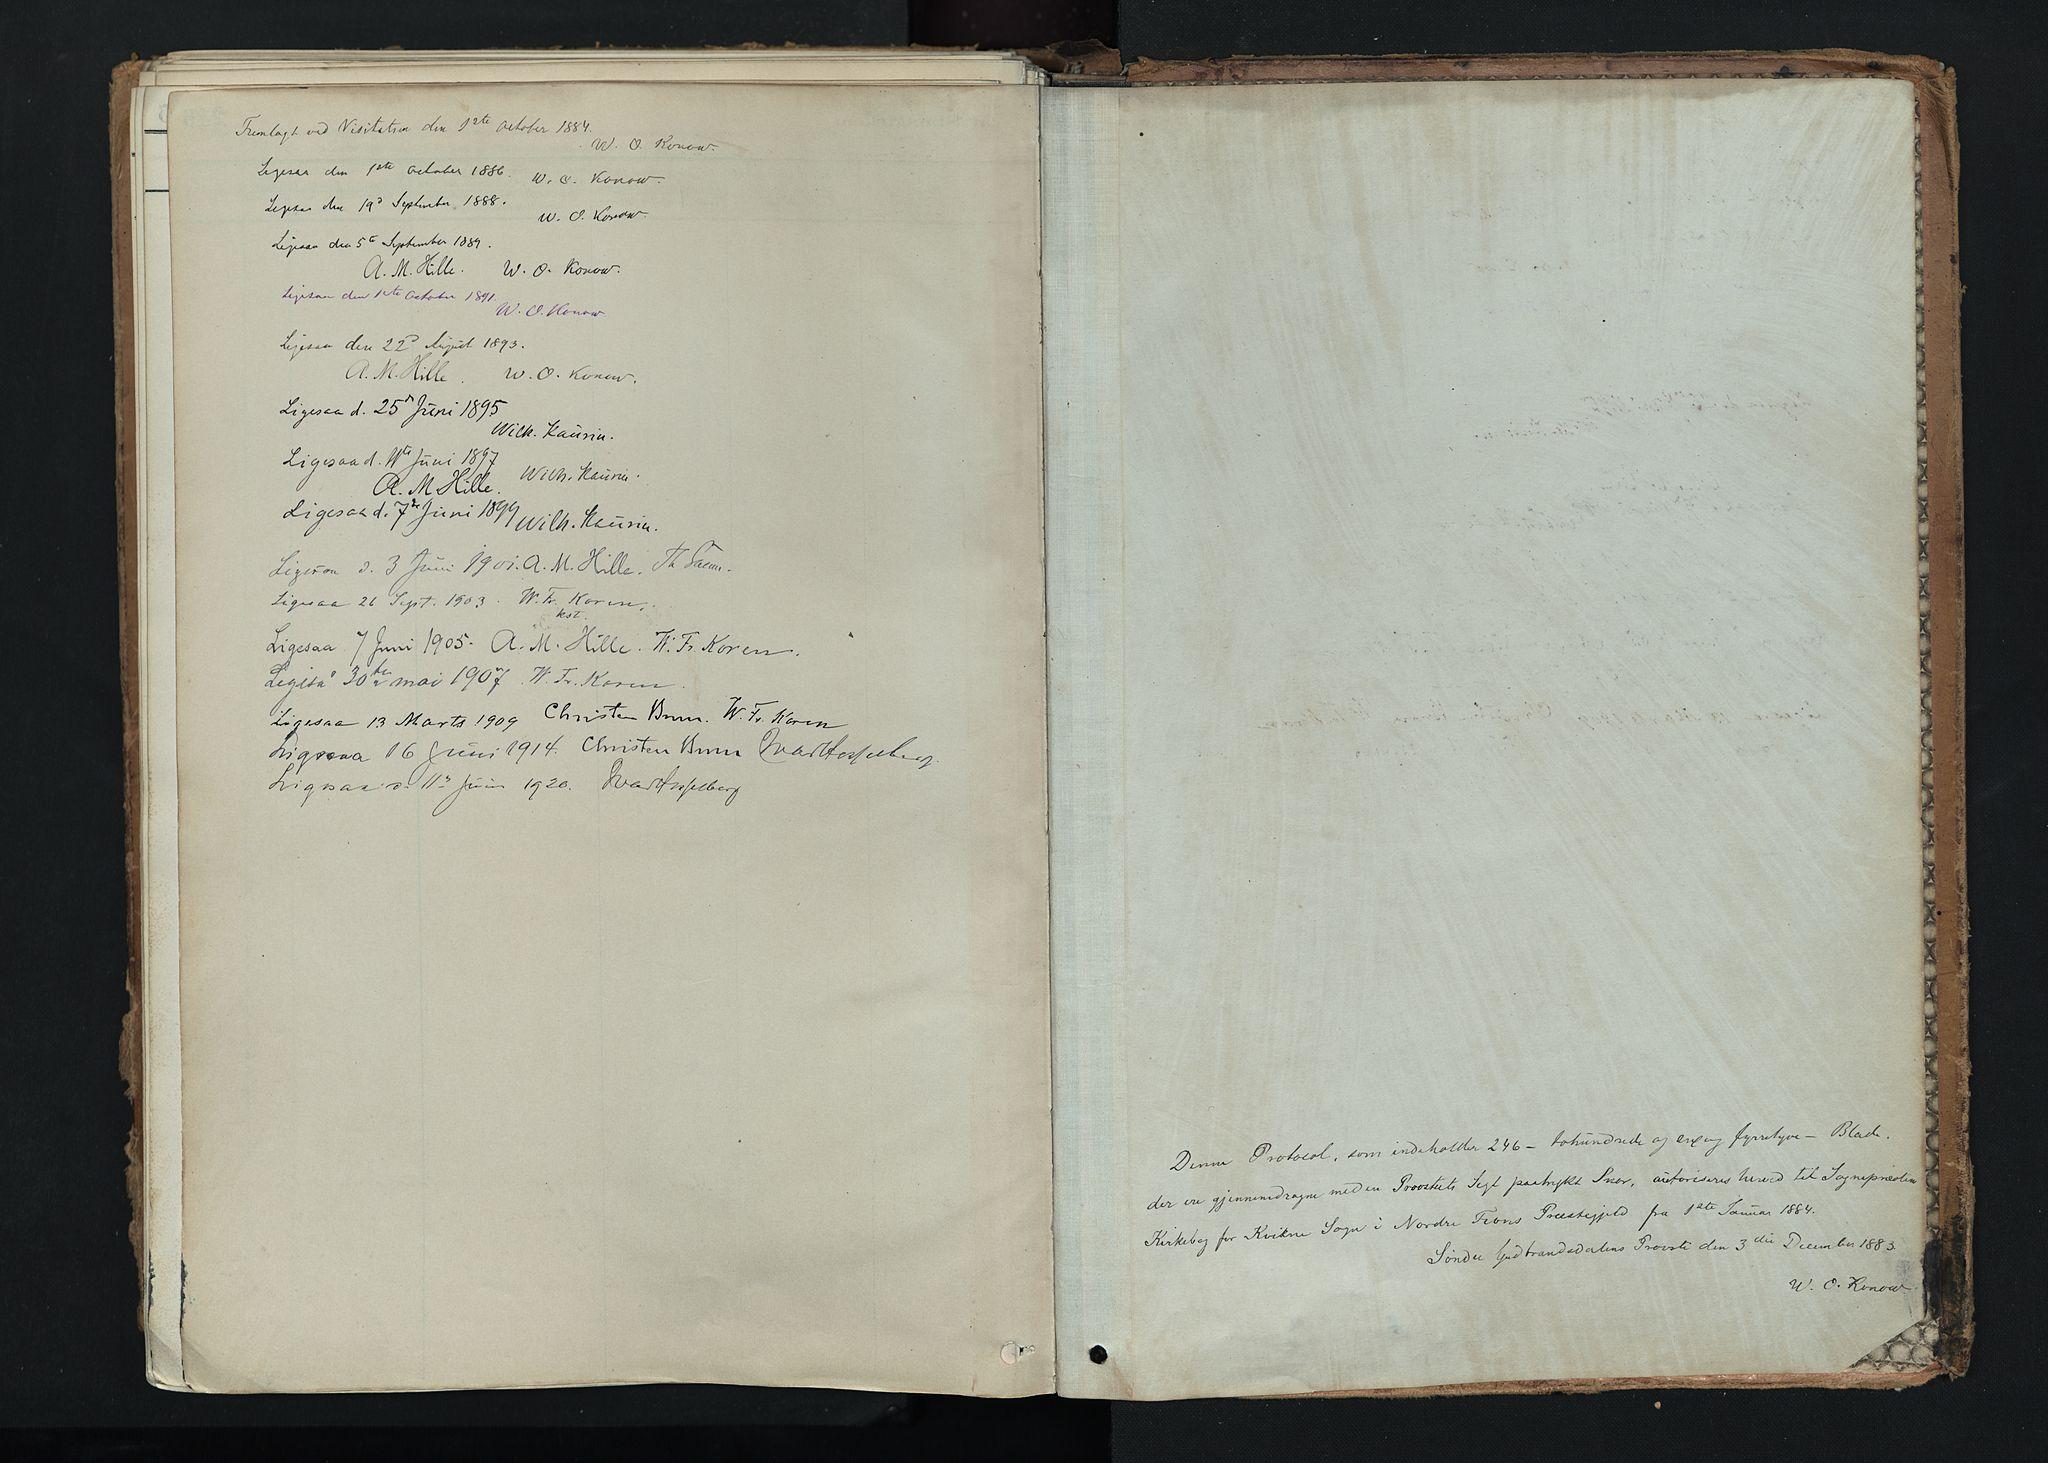 SAH, Nord-Fron prestekontor, Ministerialbok nr. 5, 1884-1914